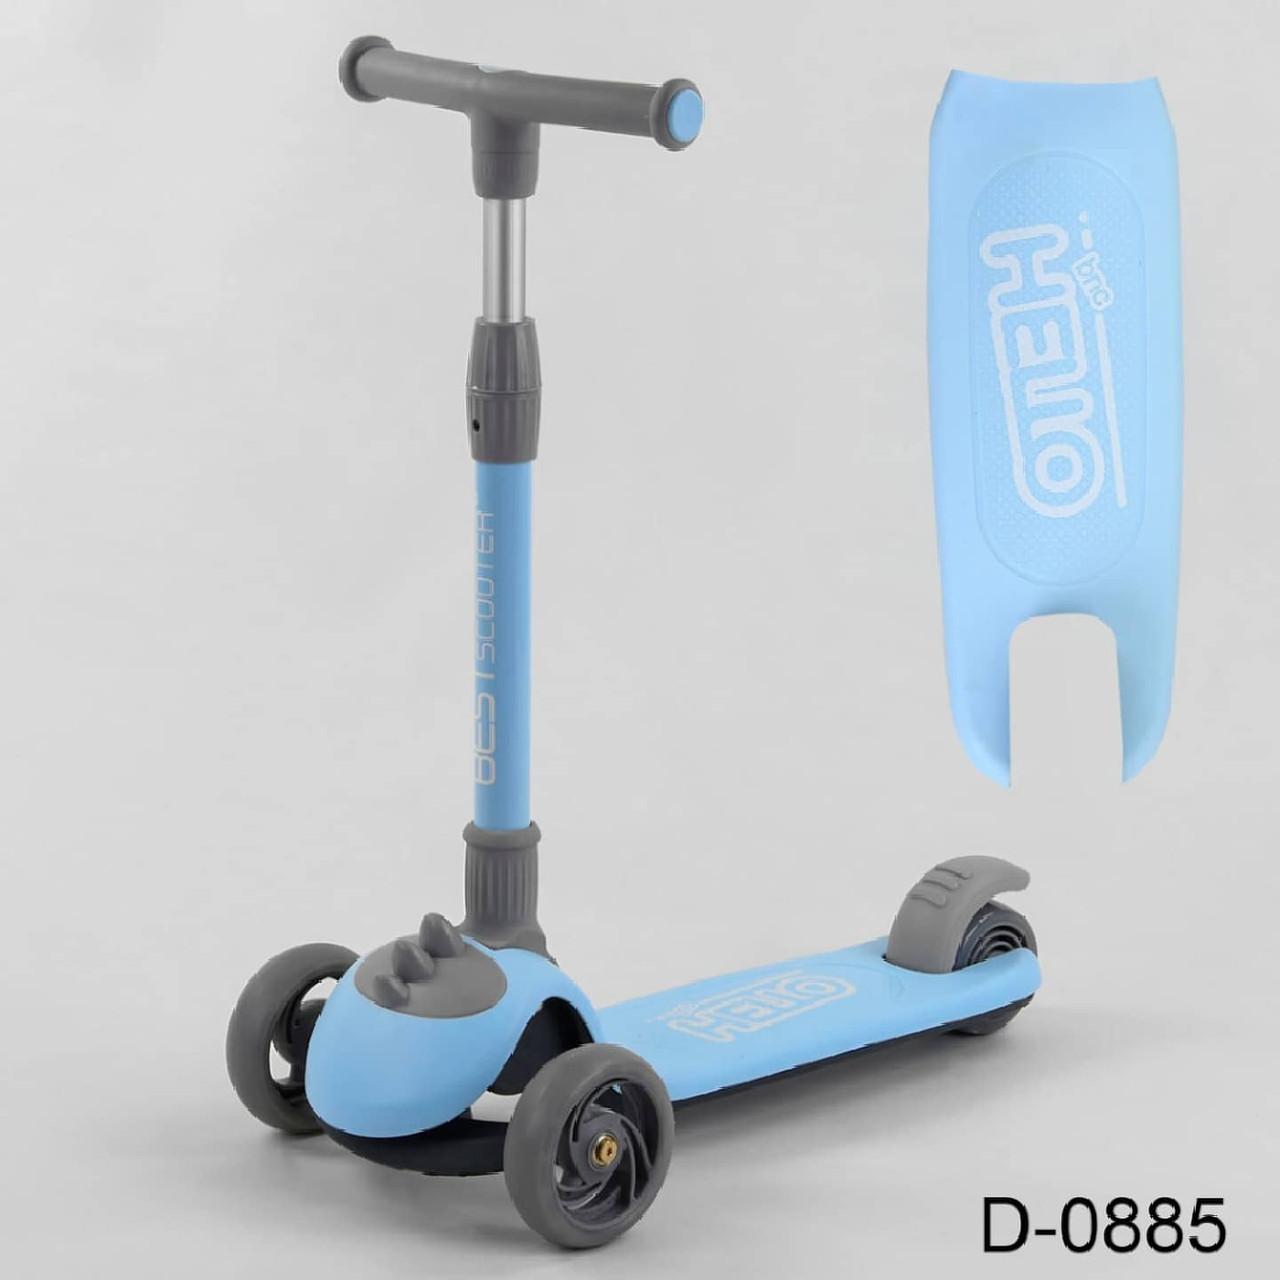 Самокат Hello D-0885 Best Scooter голубой